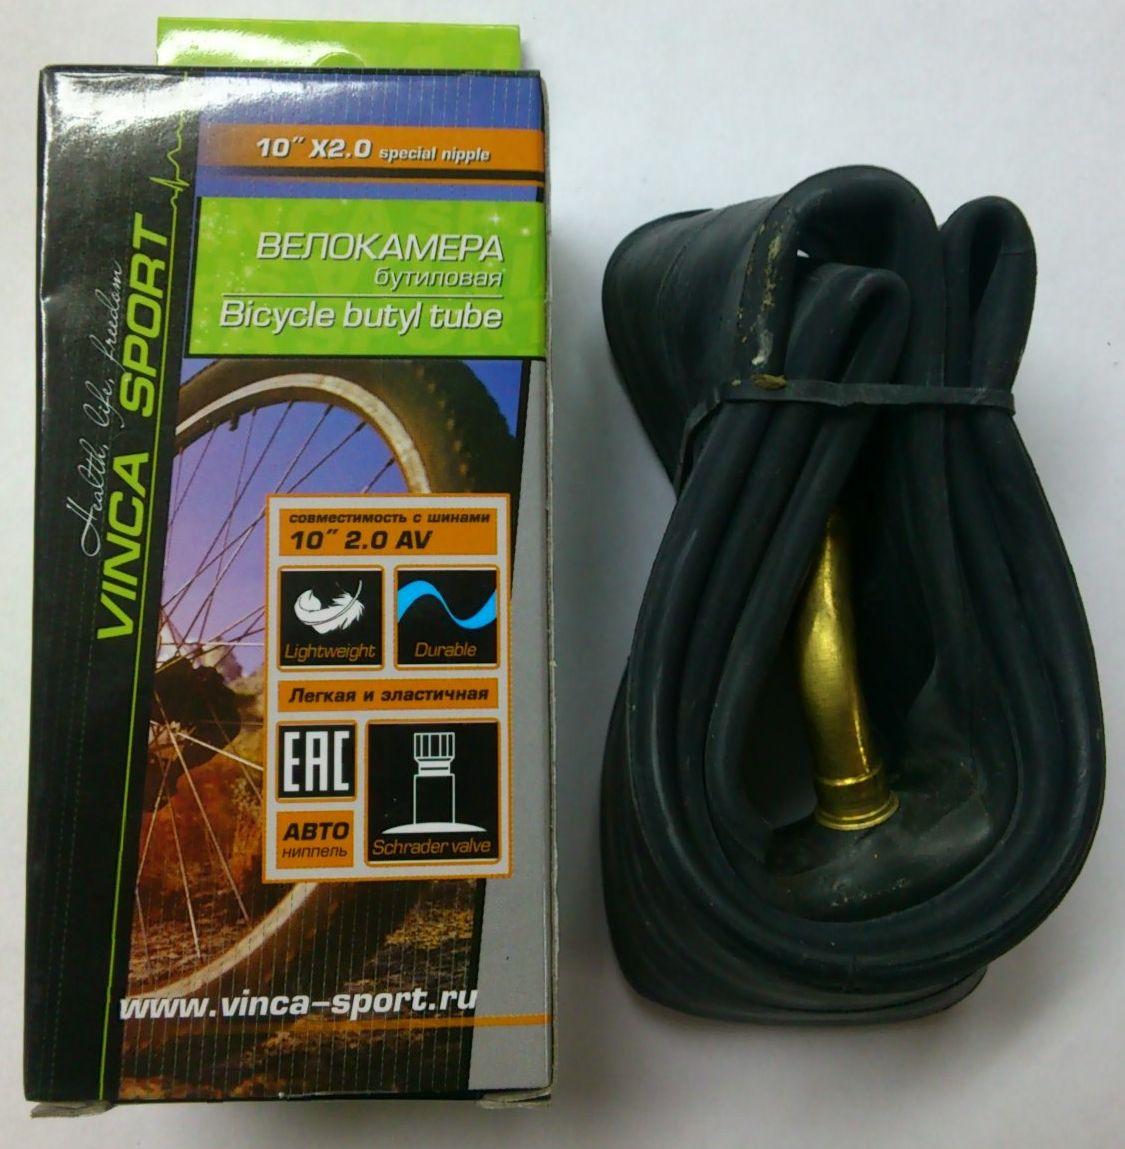 Запчасть Vinca Sport Tube 10 SN, 10x2,0,  камеры и ободные ленты  - артикул:282904